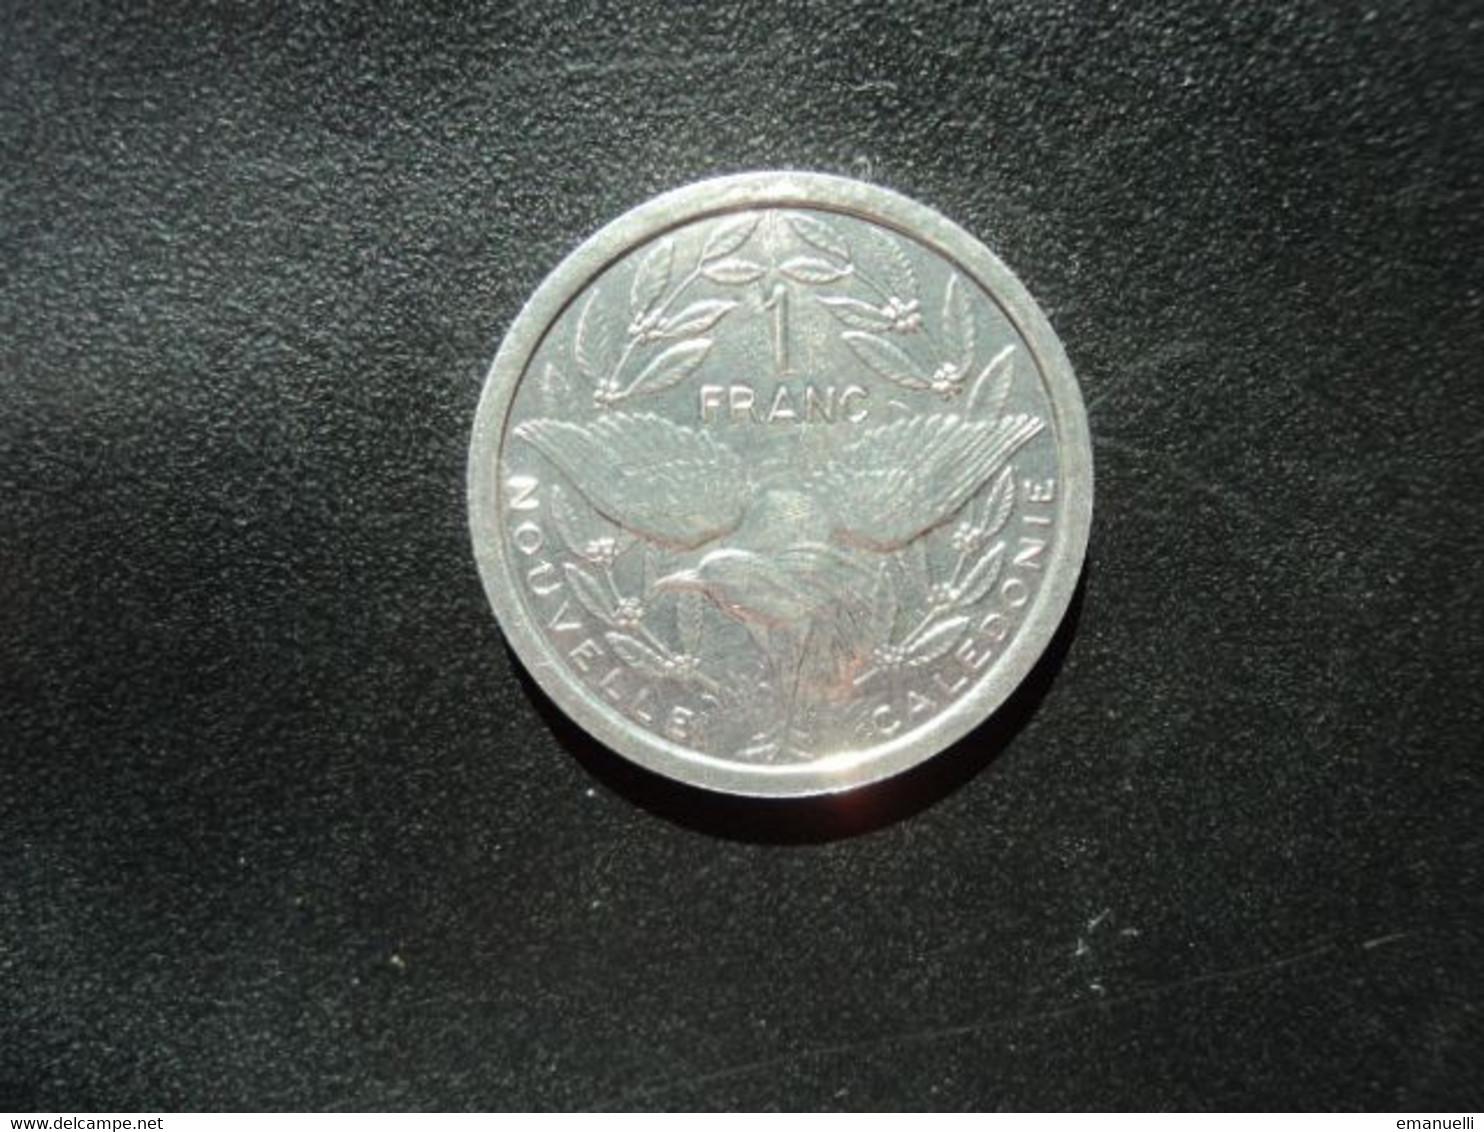 NOUVELLE CALÉDONIE : 1 FRANC   2002    KM 10    NON CIRCULÉE  * - New Caledonia